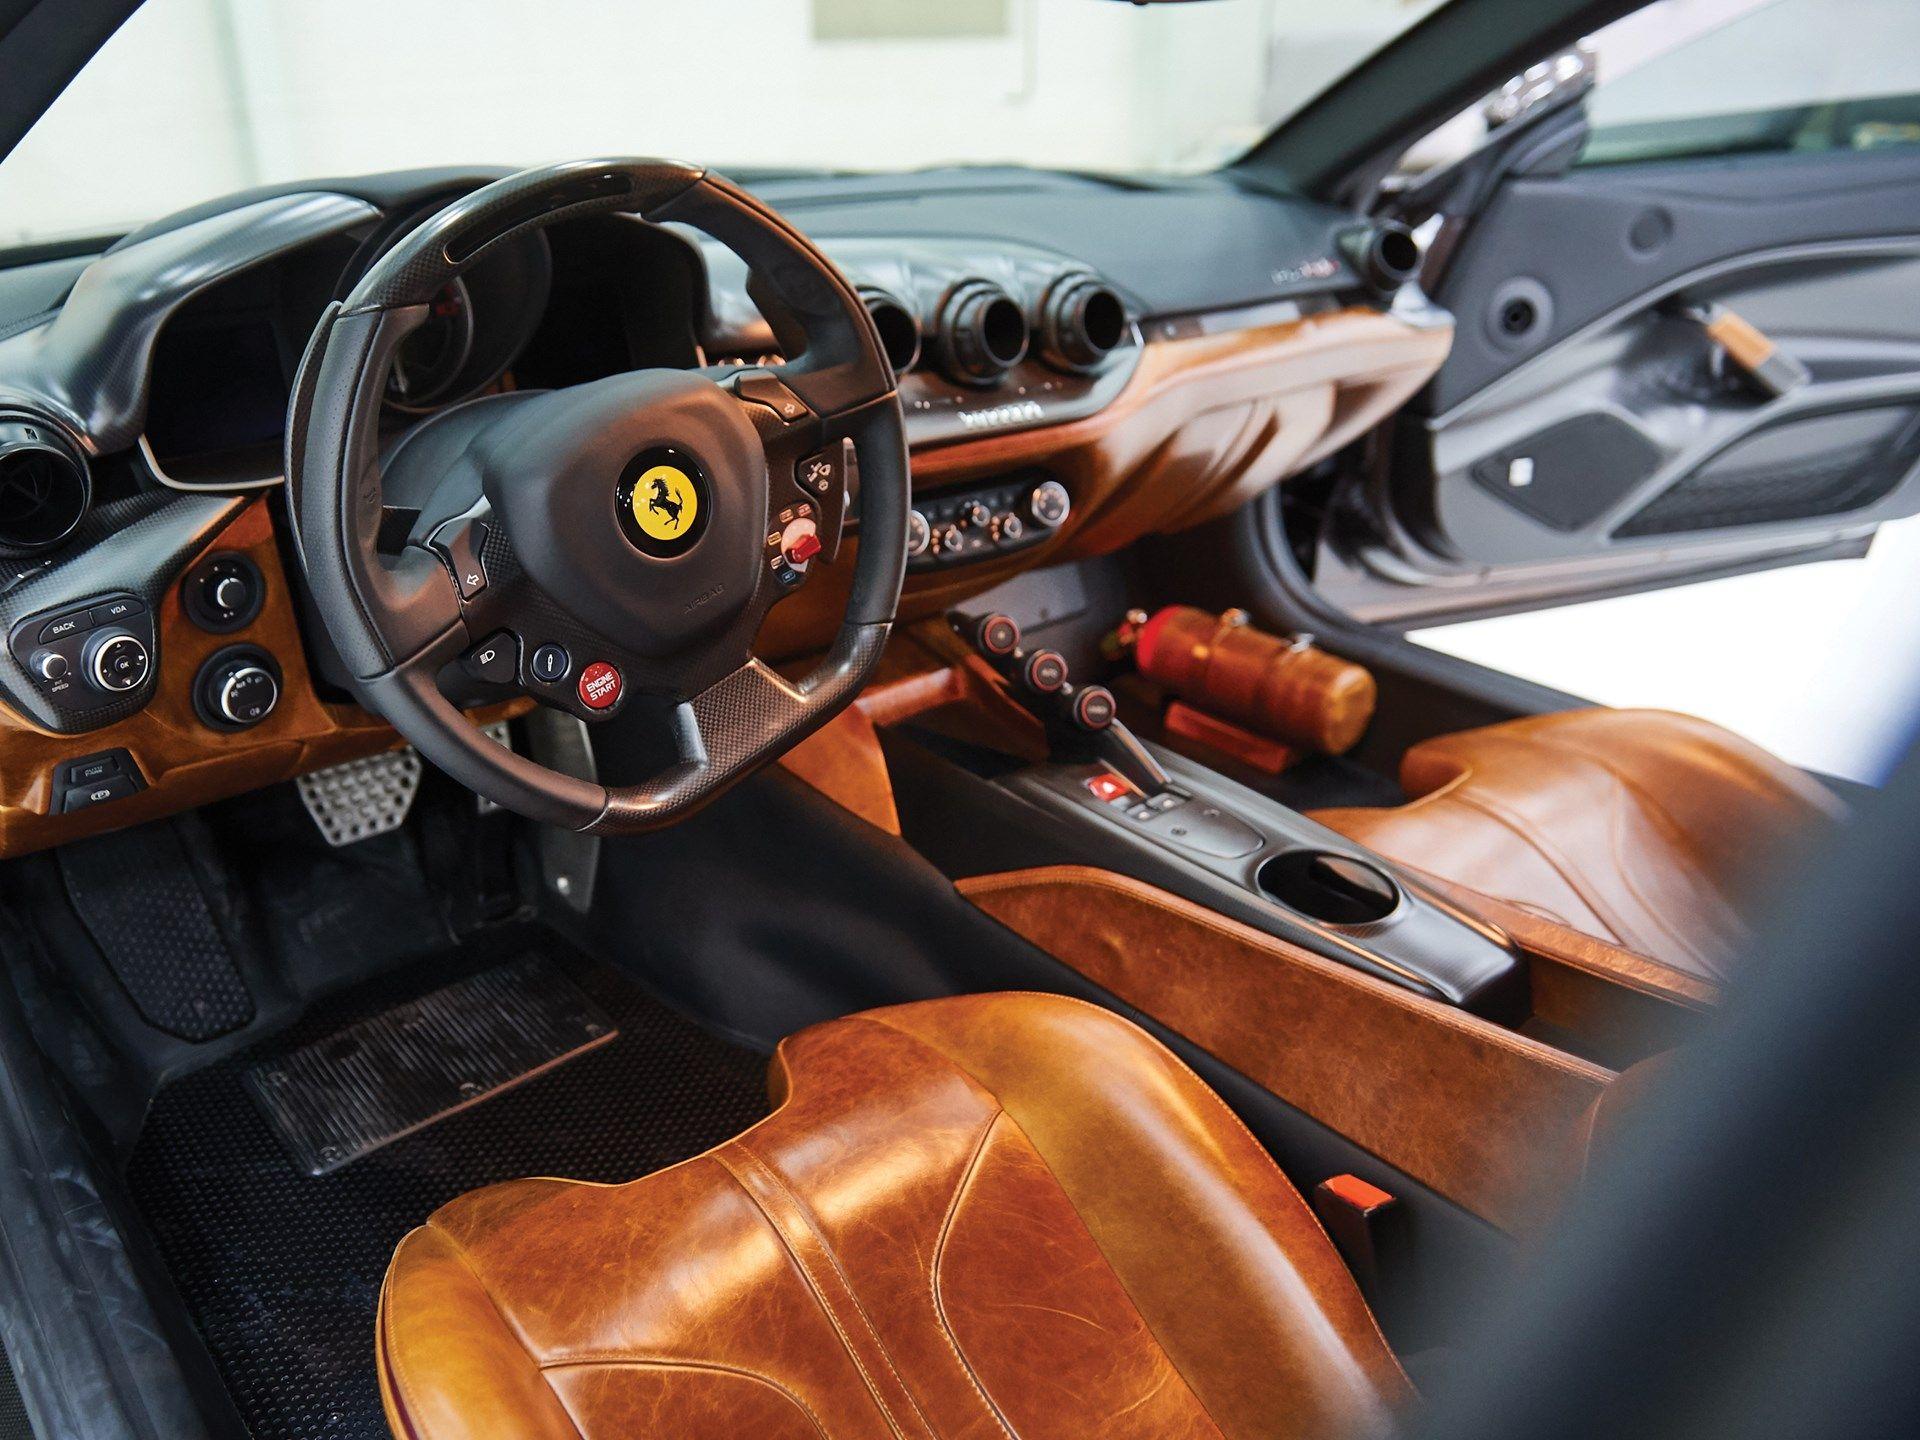 Ferrari F12 Tdf Brunito Custom Interior Ferrari F12 Tdf Ferrari F12 Ferrari